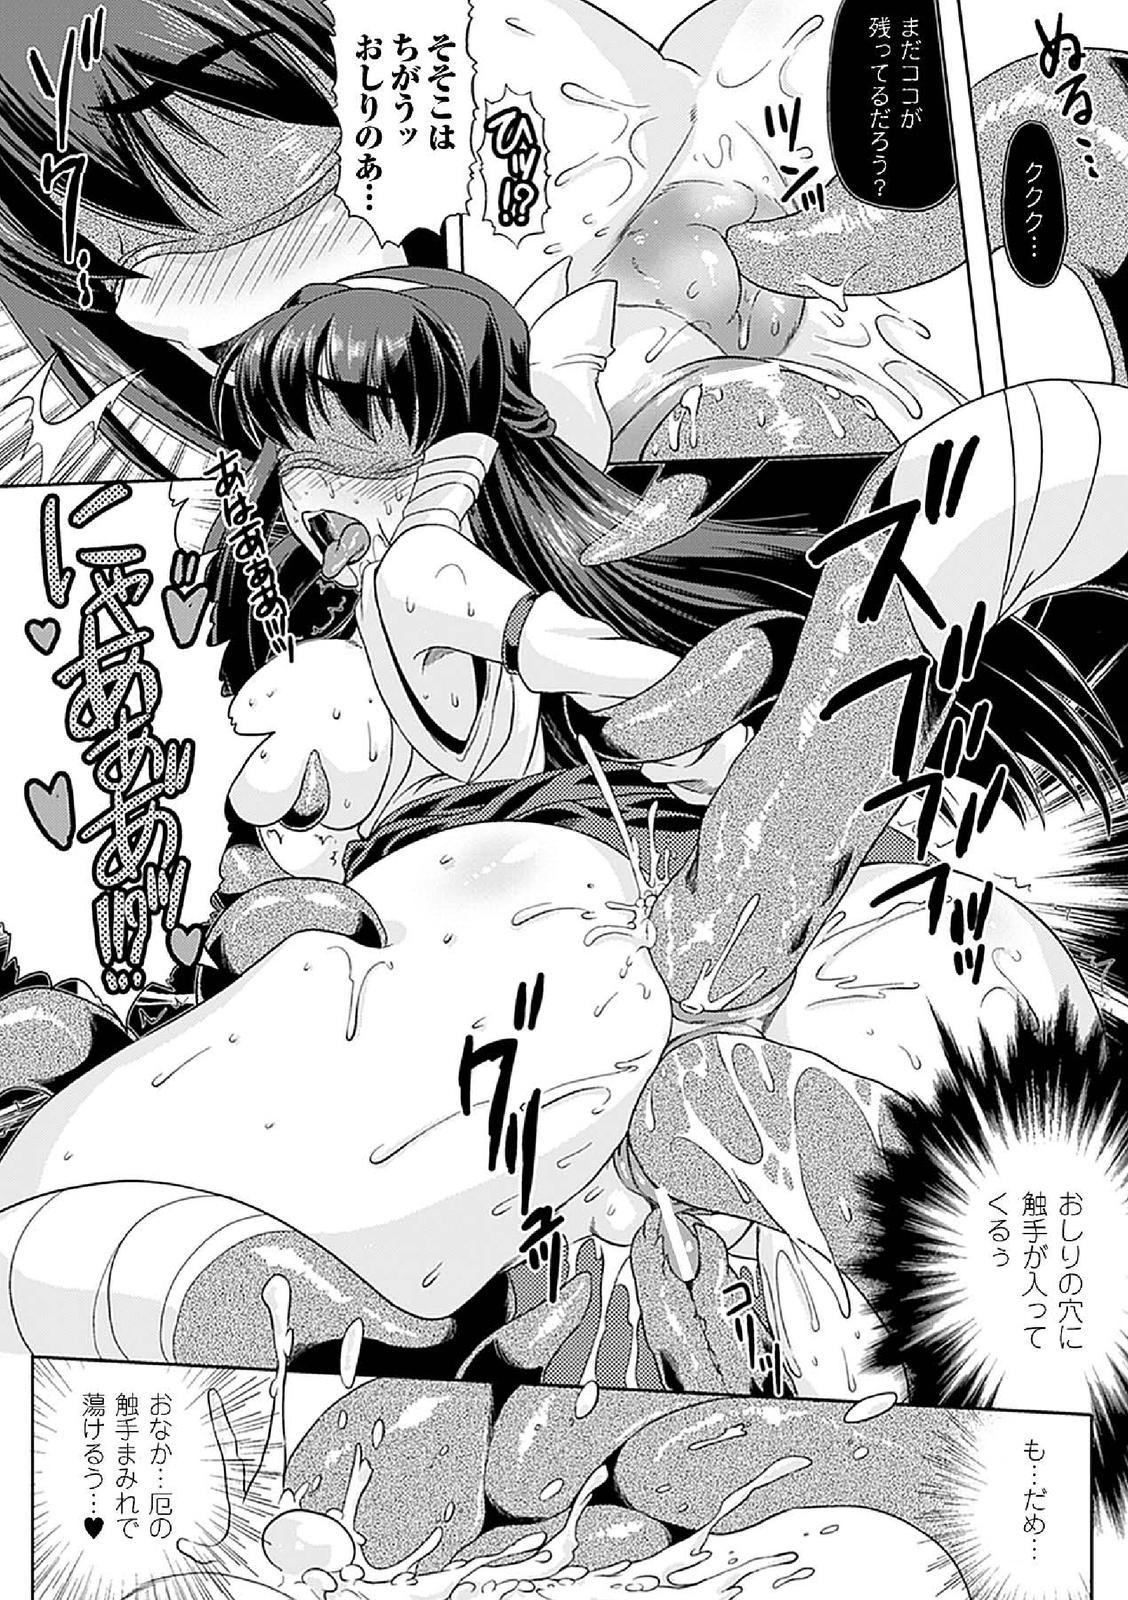 Mekakushi Anthology Comics Vol. 1 39